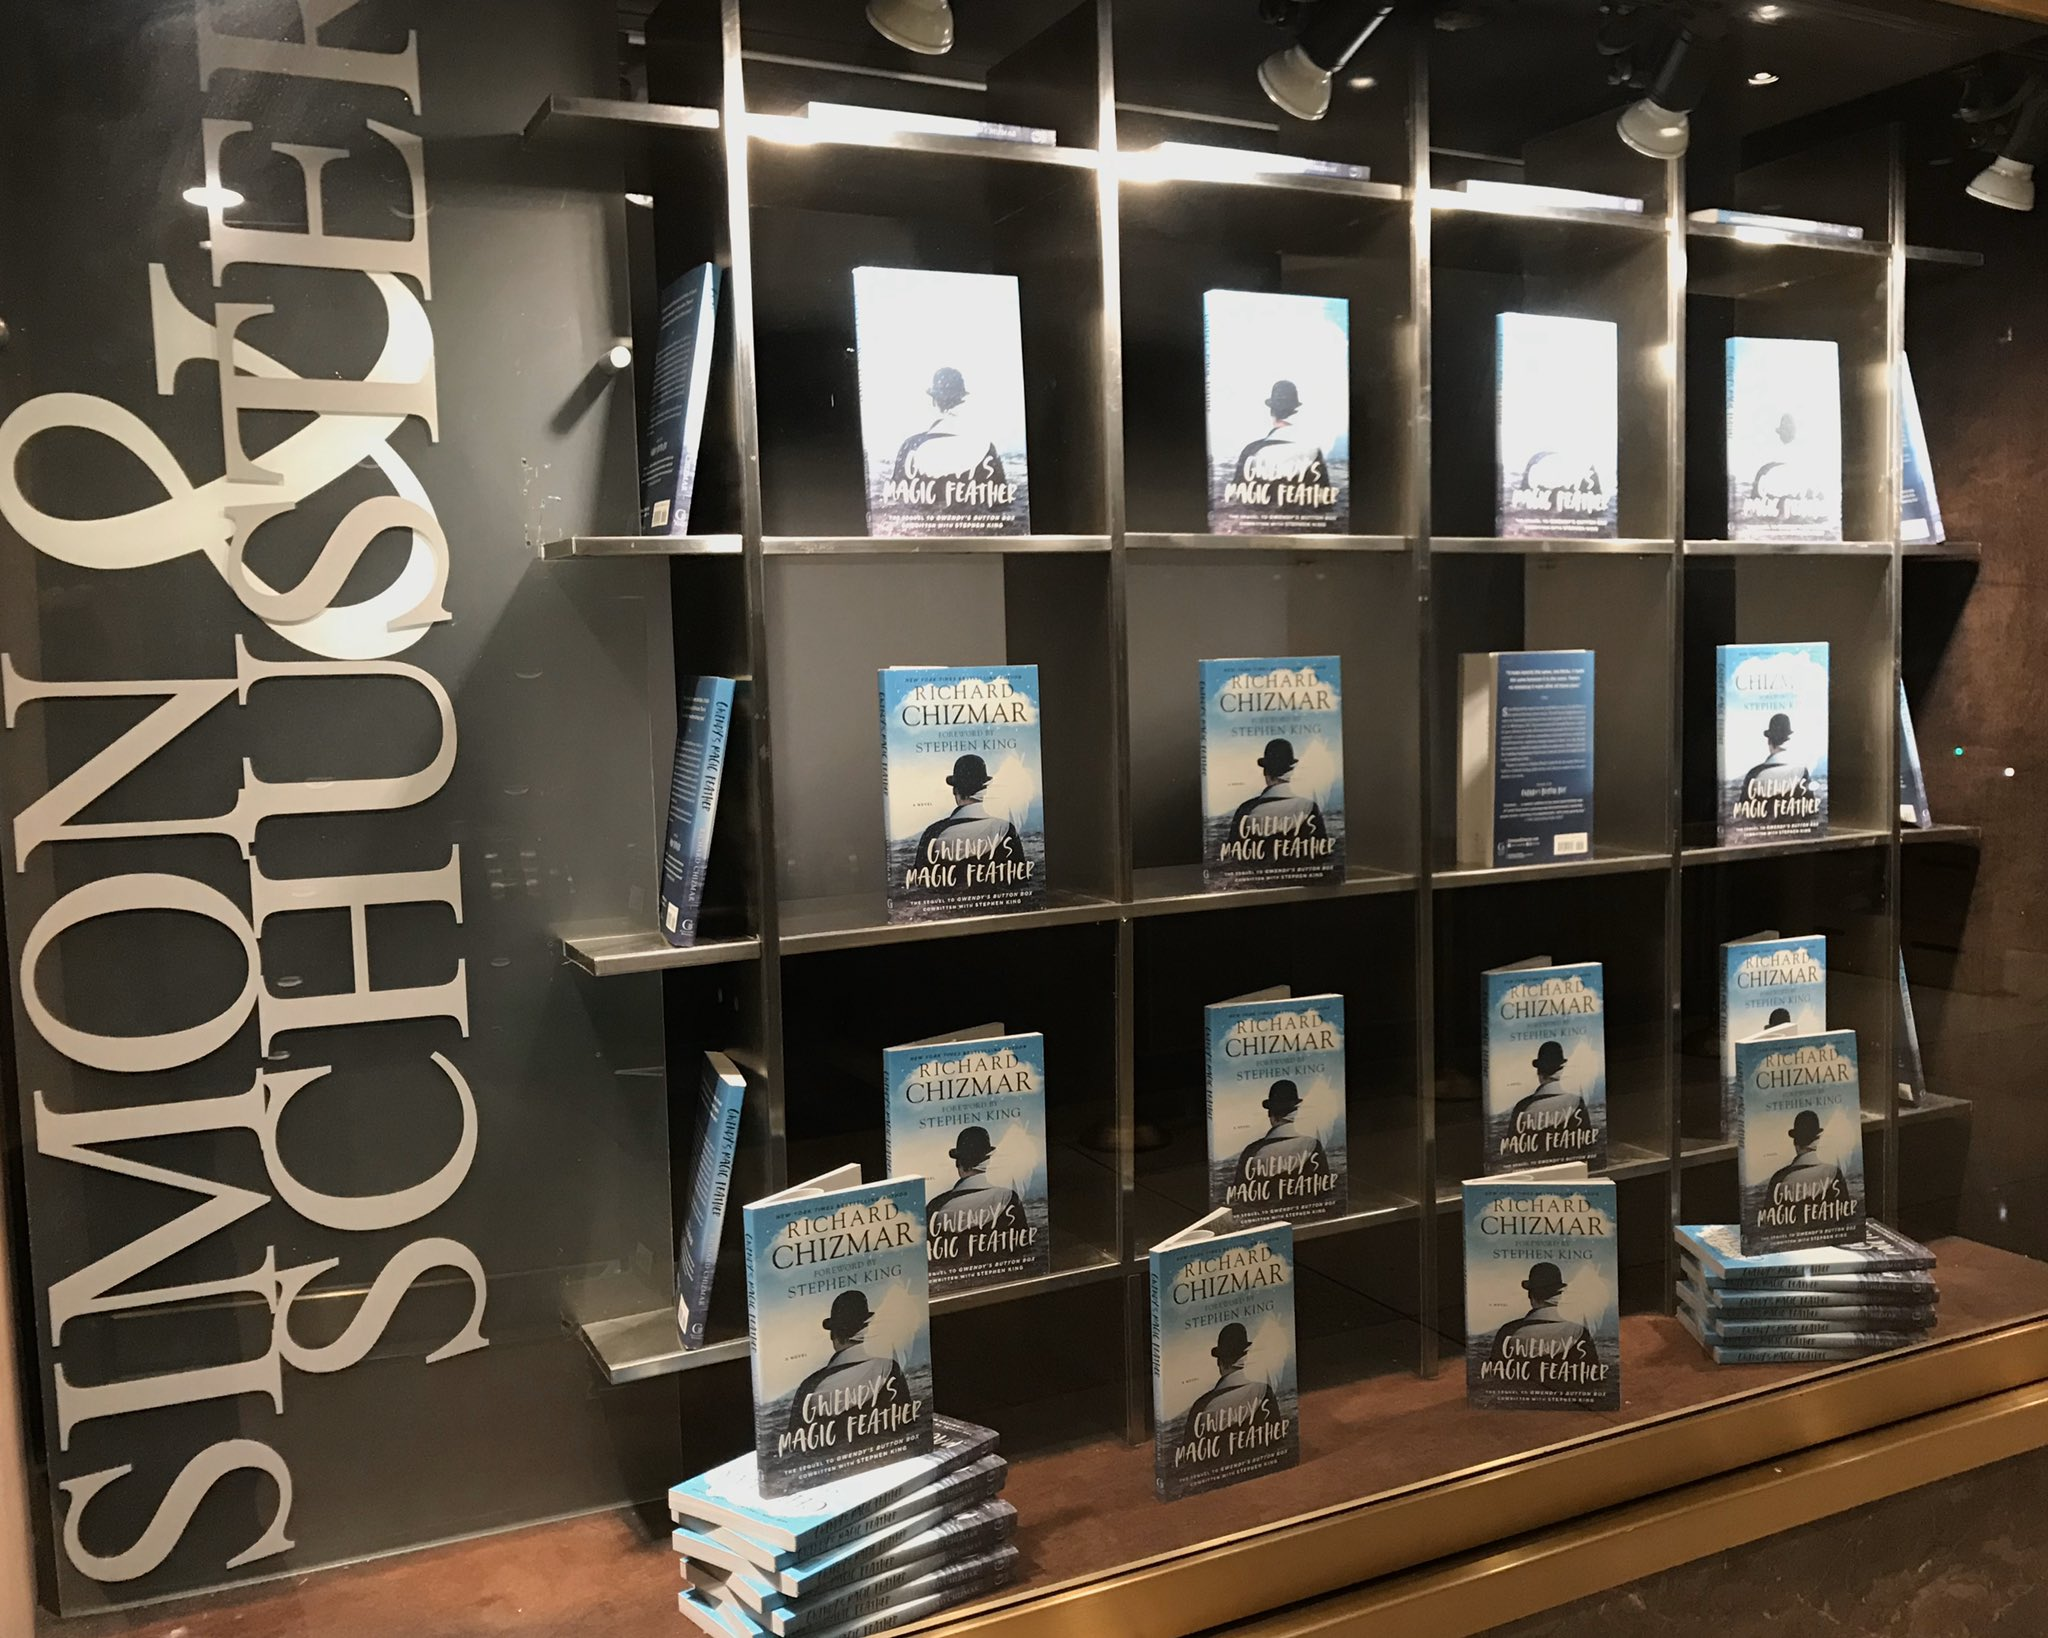 Simon & Schuster lobby today. https://t.co/6zqBknyXAc